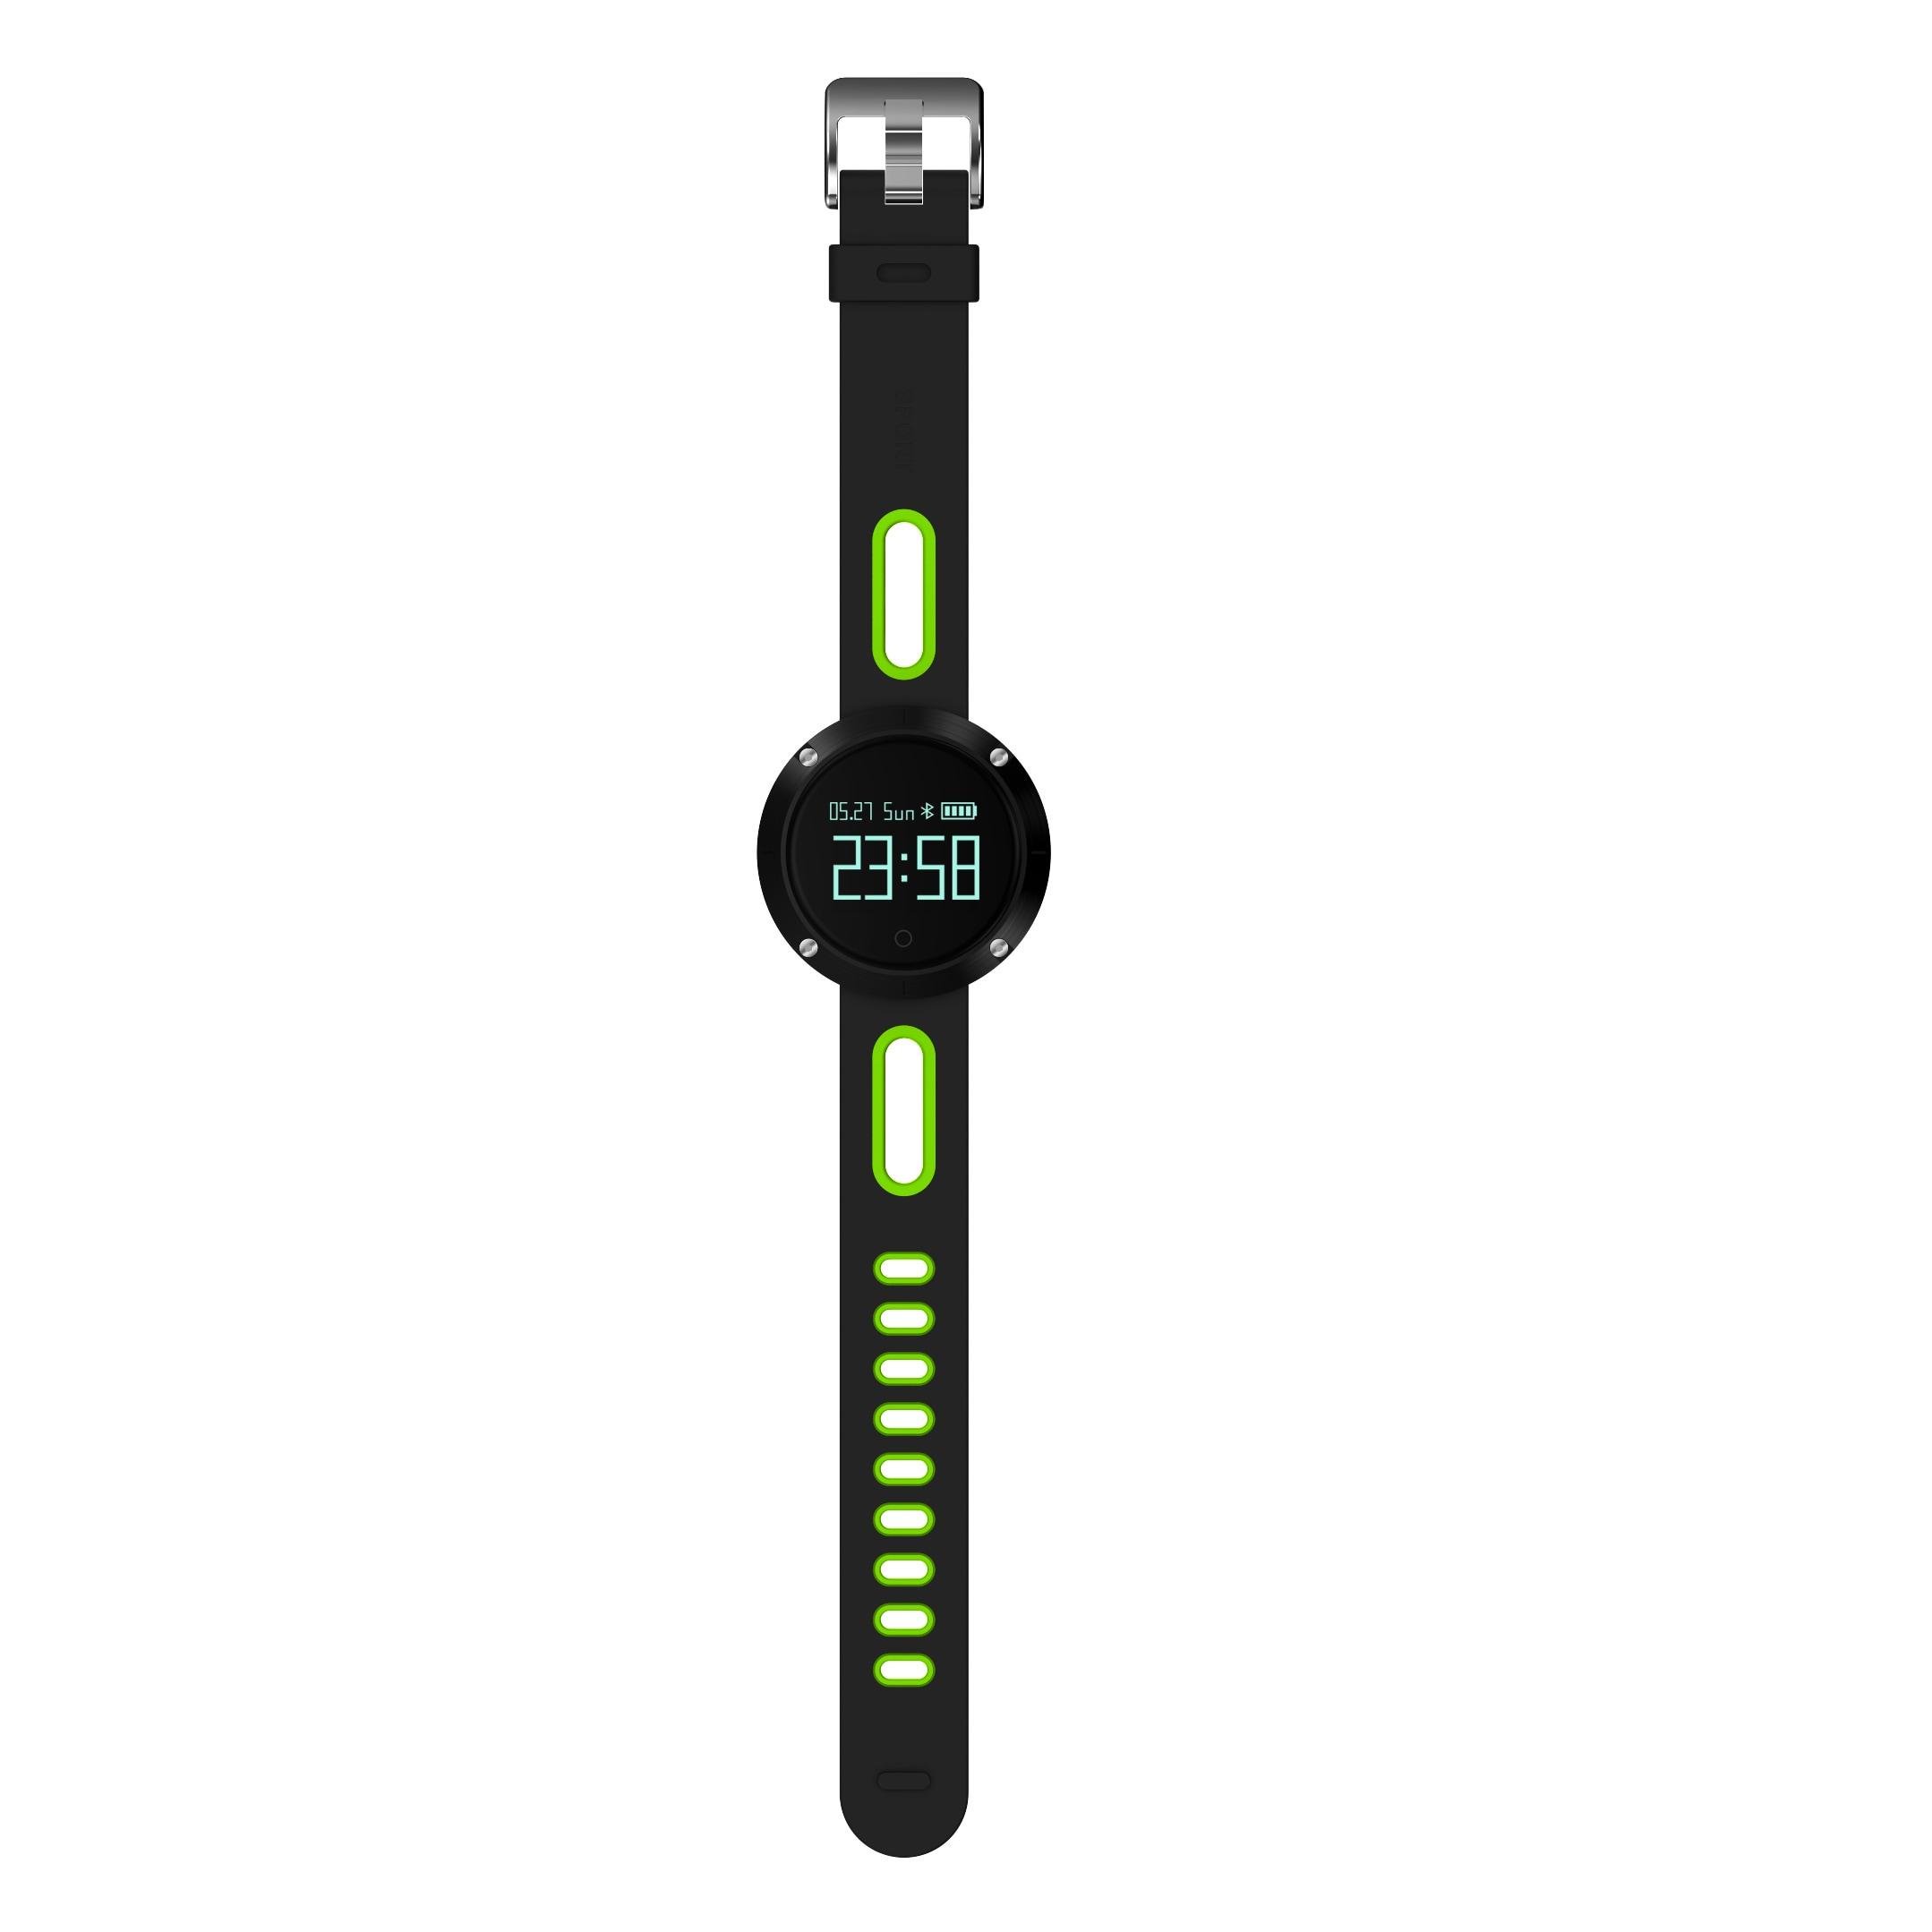 DOMINO DM58 0.95 Inch Round Display Screen Smart Bracelet Heart Rate Monitor Sport Wristband Fitness Tracker Black - 8